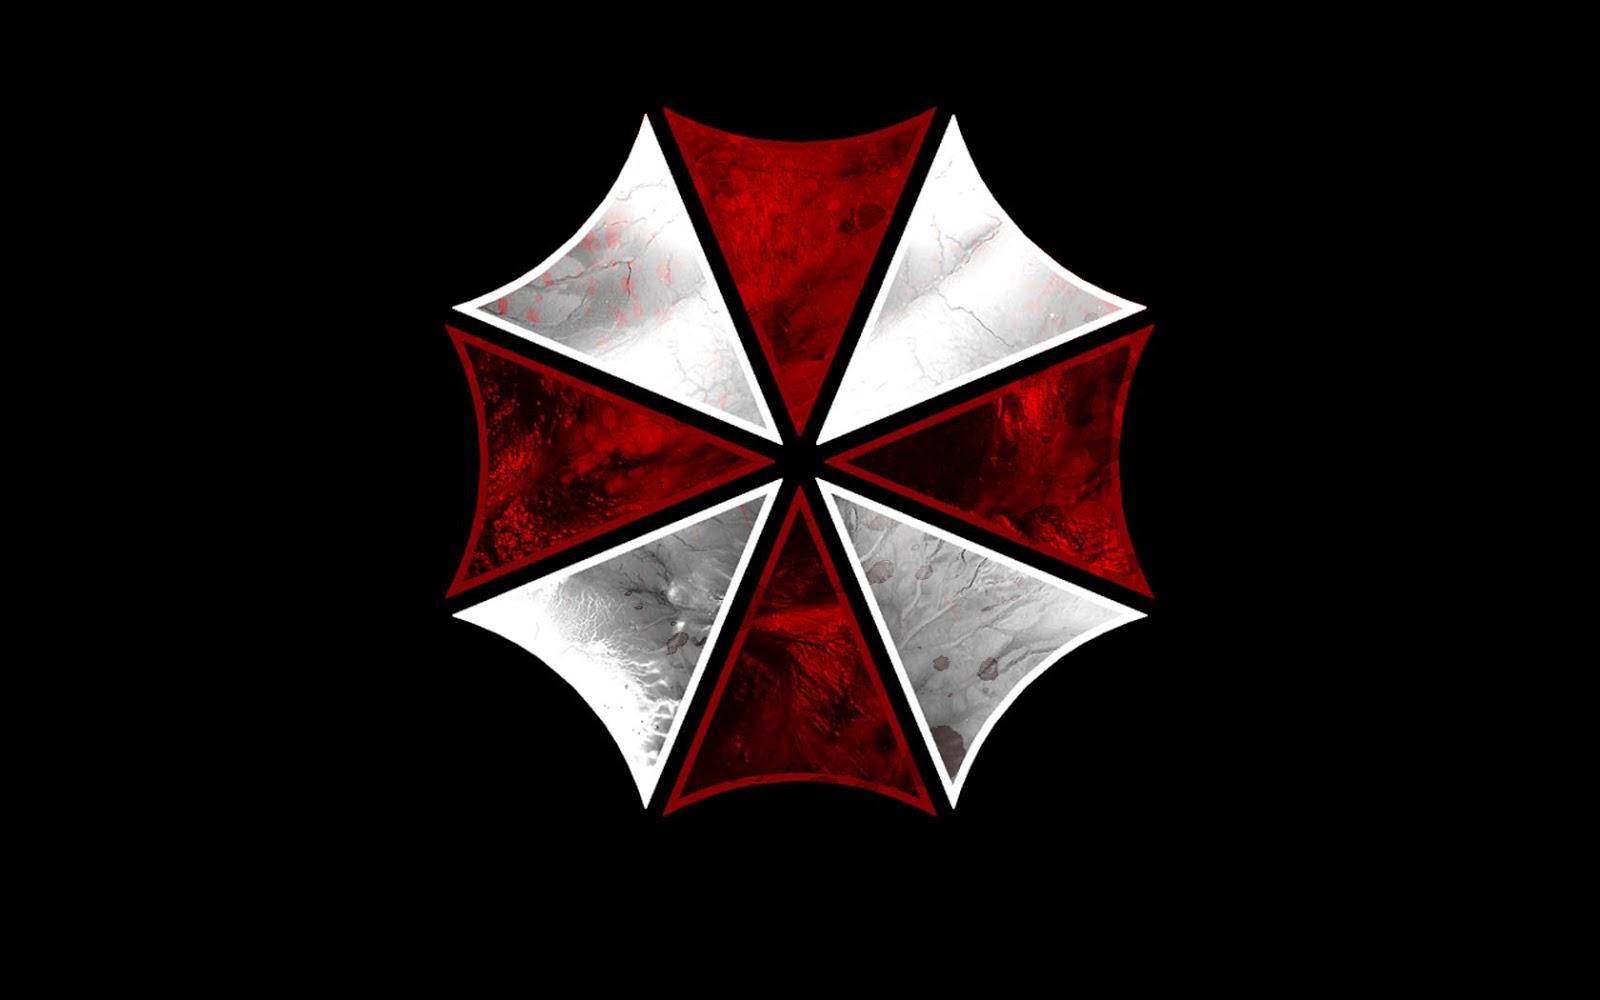 http://3.bp.blogspot.com/-JXkovDB9JUM/TqCIC3EgyhI/AAAAAAAADlQ/cbQRNIMuB2g/s1600/Umbrella_Corp_Logo_HD_Wallpaper_Vvallpaper.Net.jpg